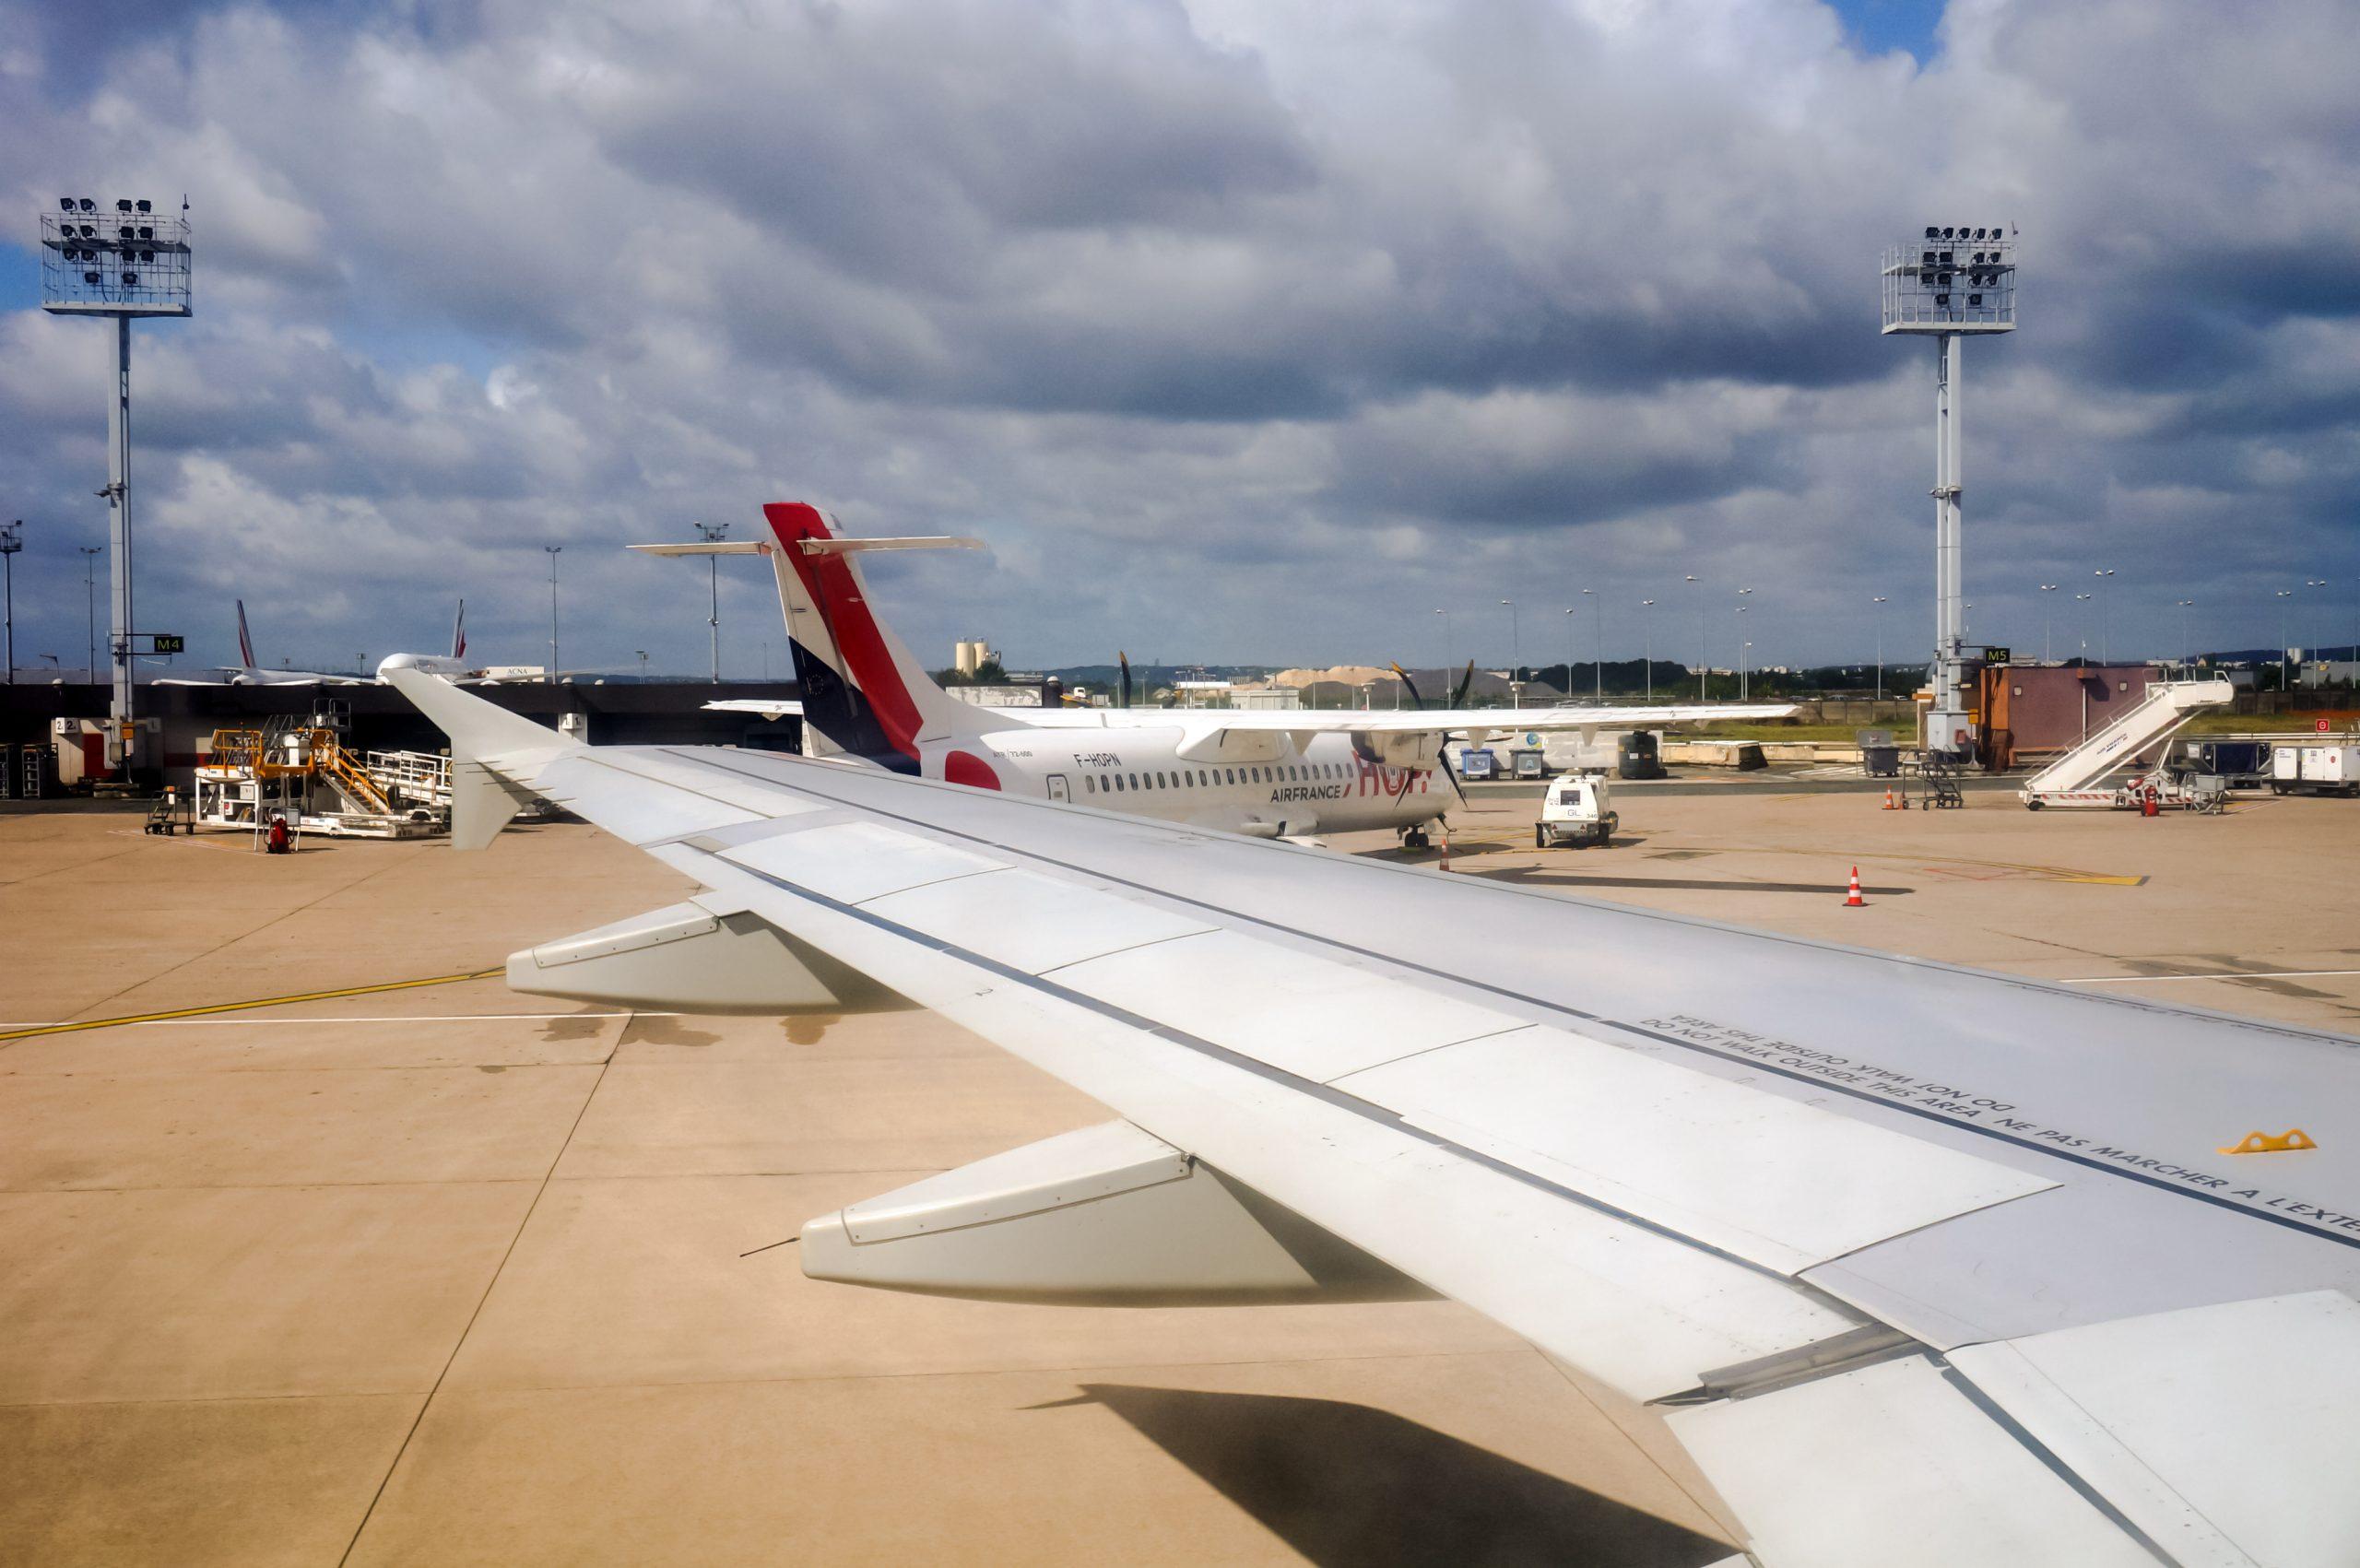 Franske indenrigsfly i Orly Airport. (Foto: S. Pech | shutterstock)